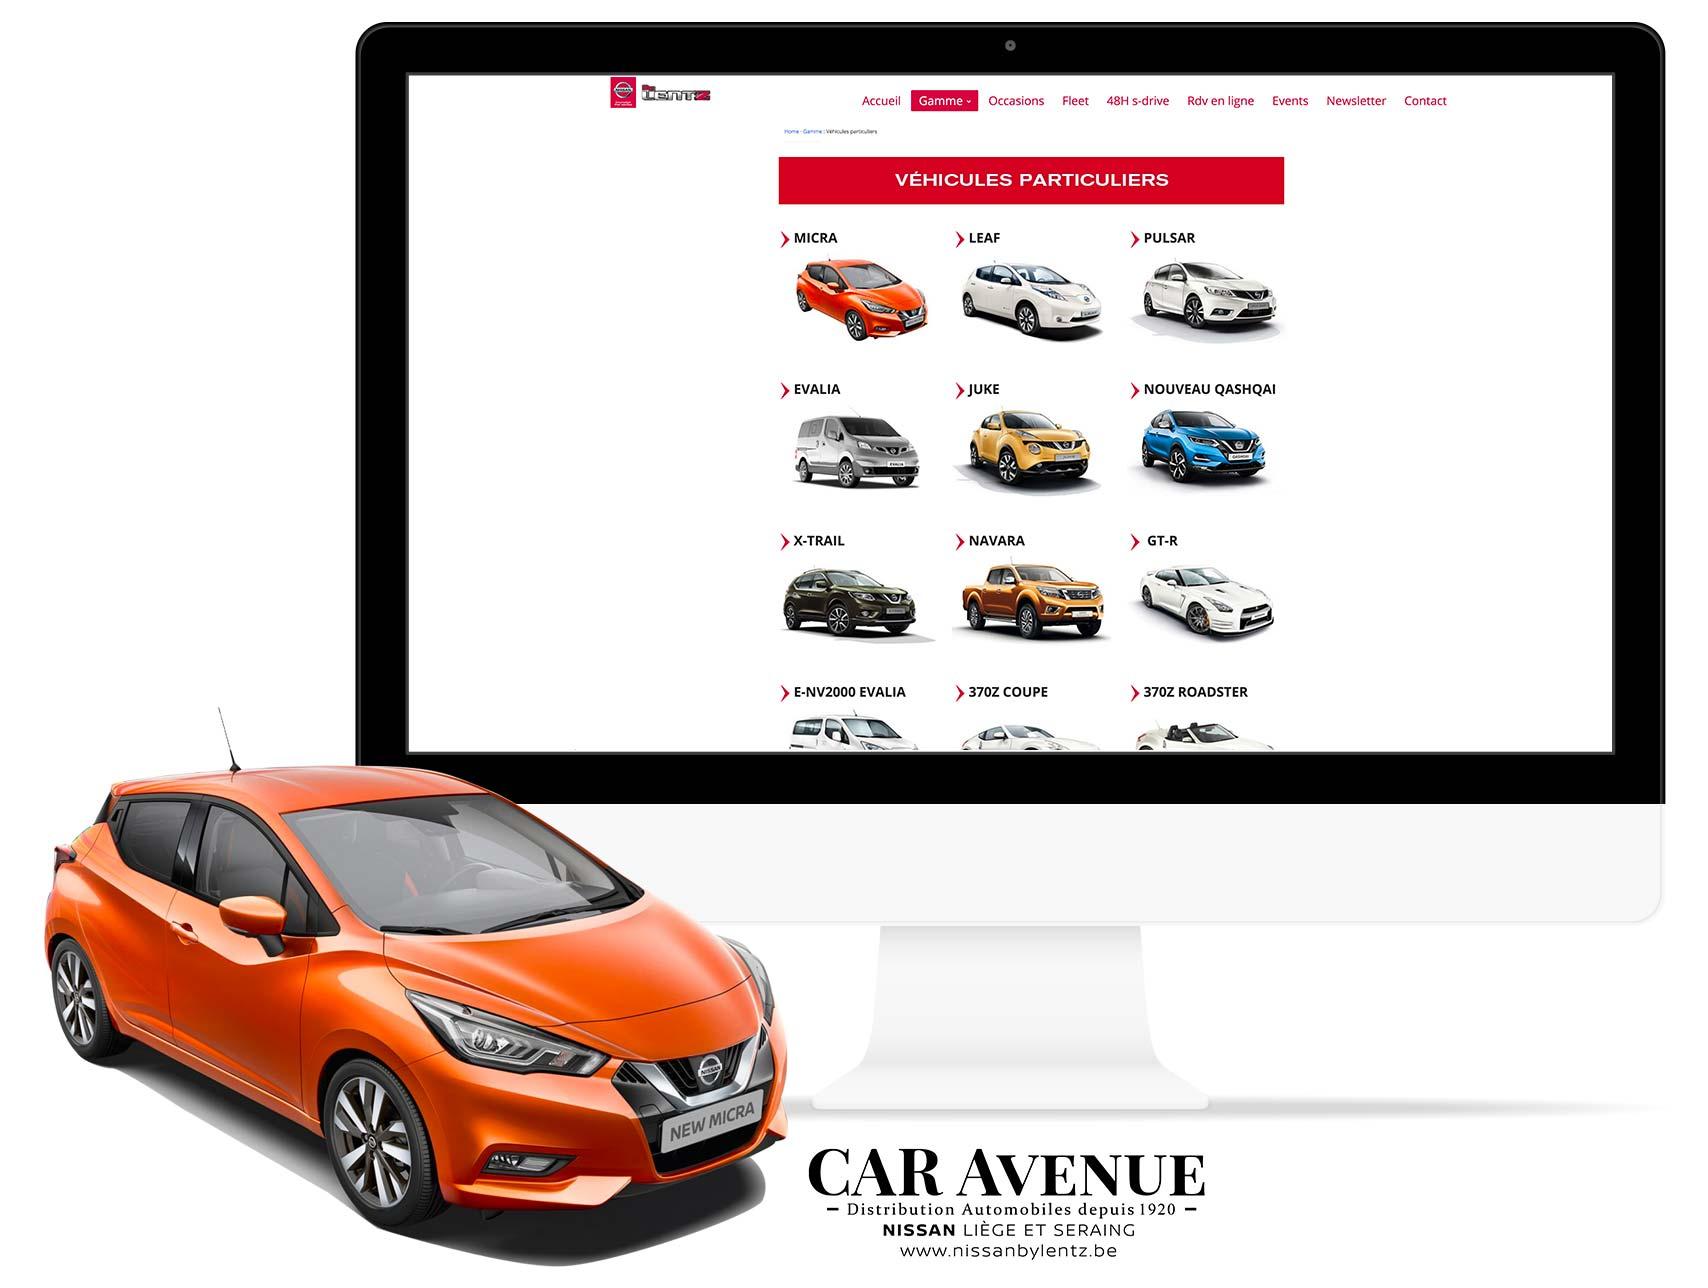 Nissan_by_lentz_car_avenue_roxane_studio_agence_pub_liege